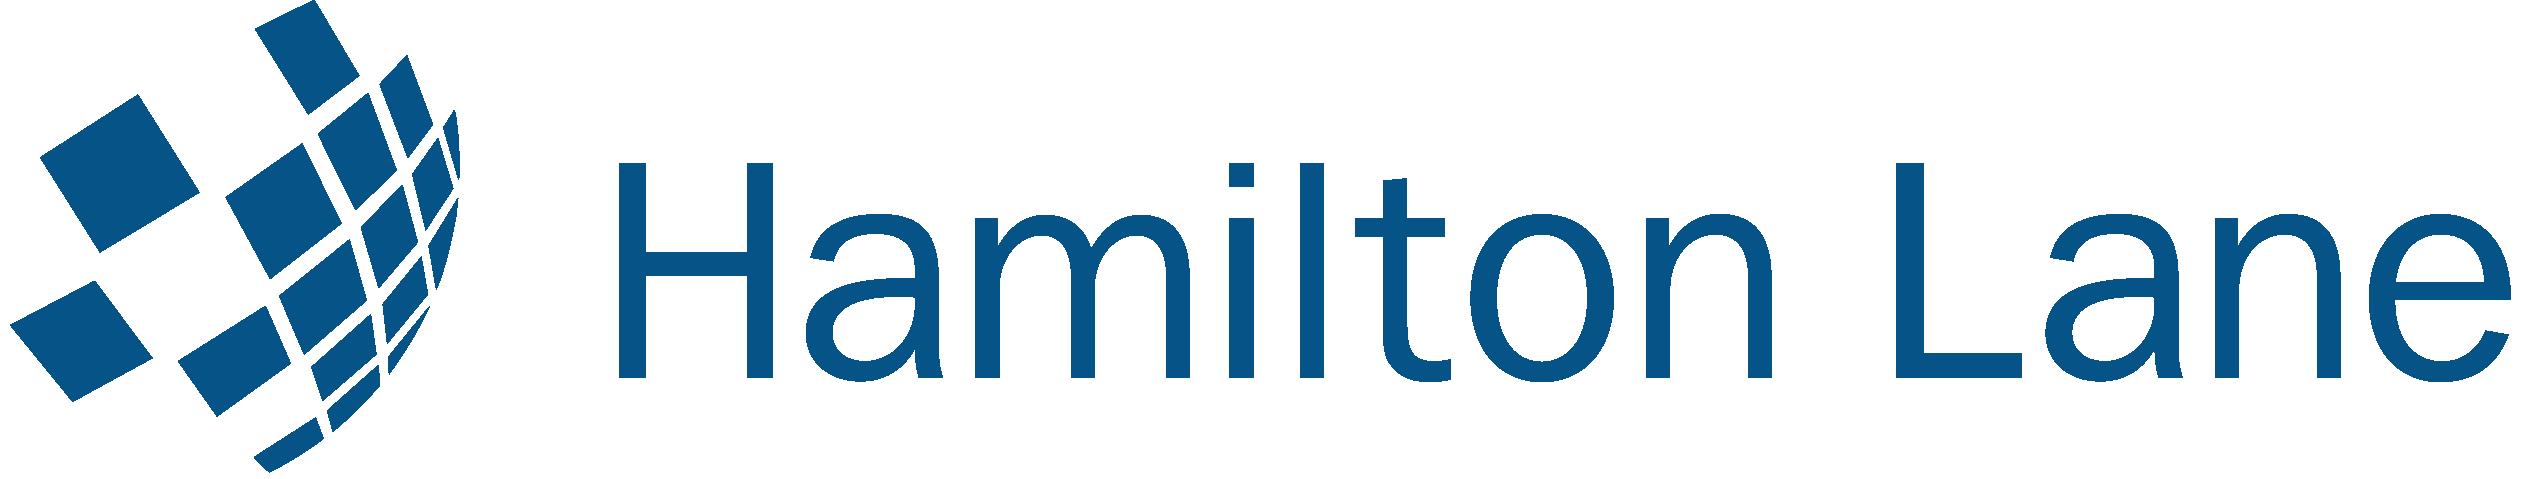 Hamilton_Lane_Logo.png